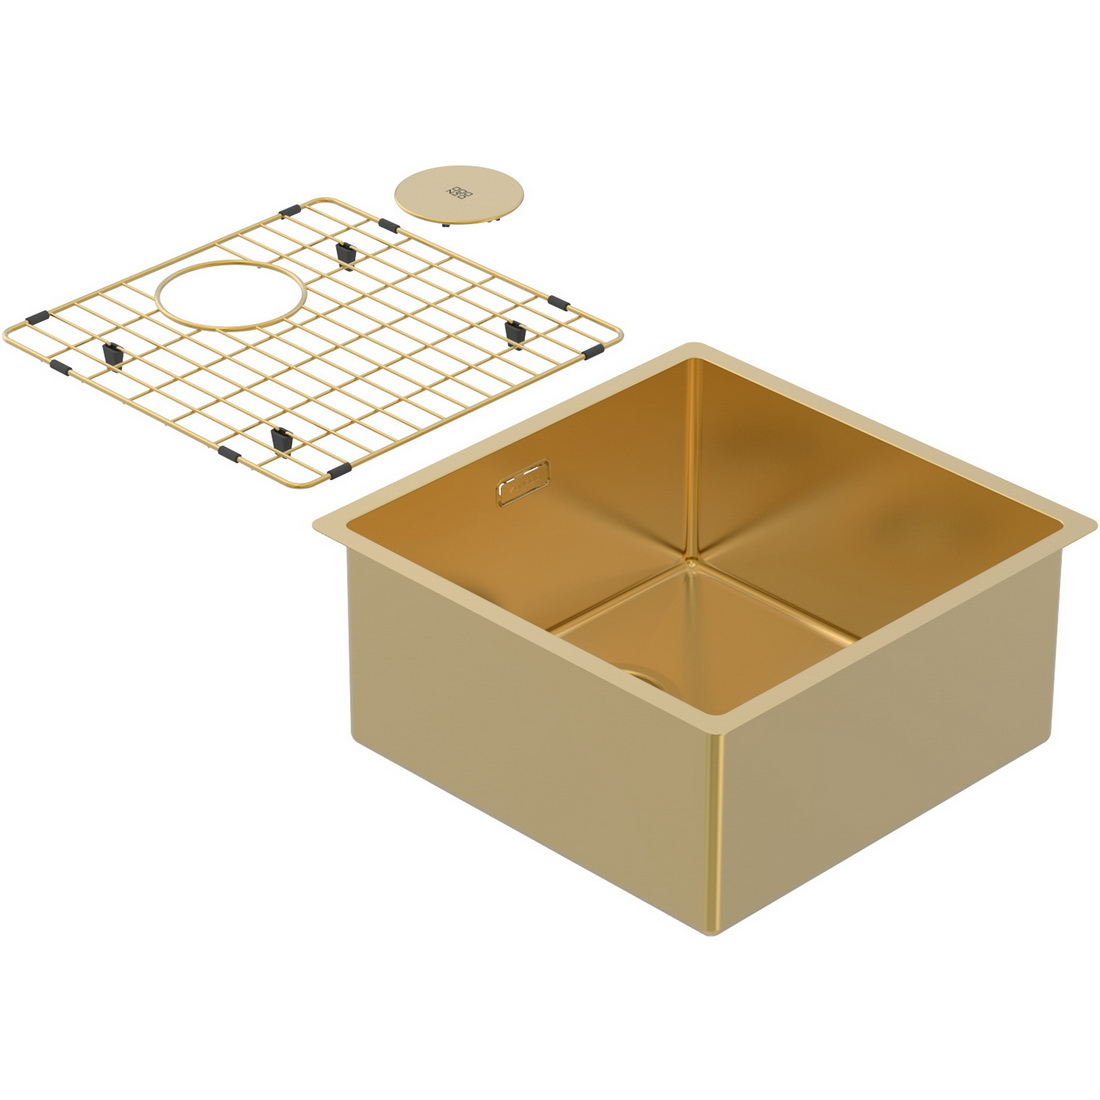 440x440x200mm Single Medium Bowl Undermount Kitchen Sink Cayman Eureka Gold PearlArc Finish